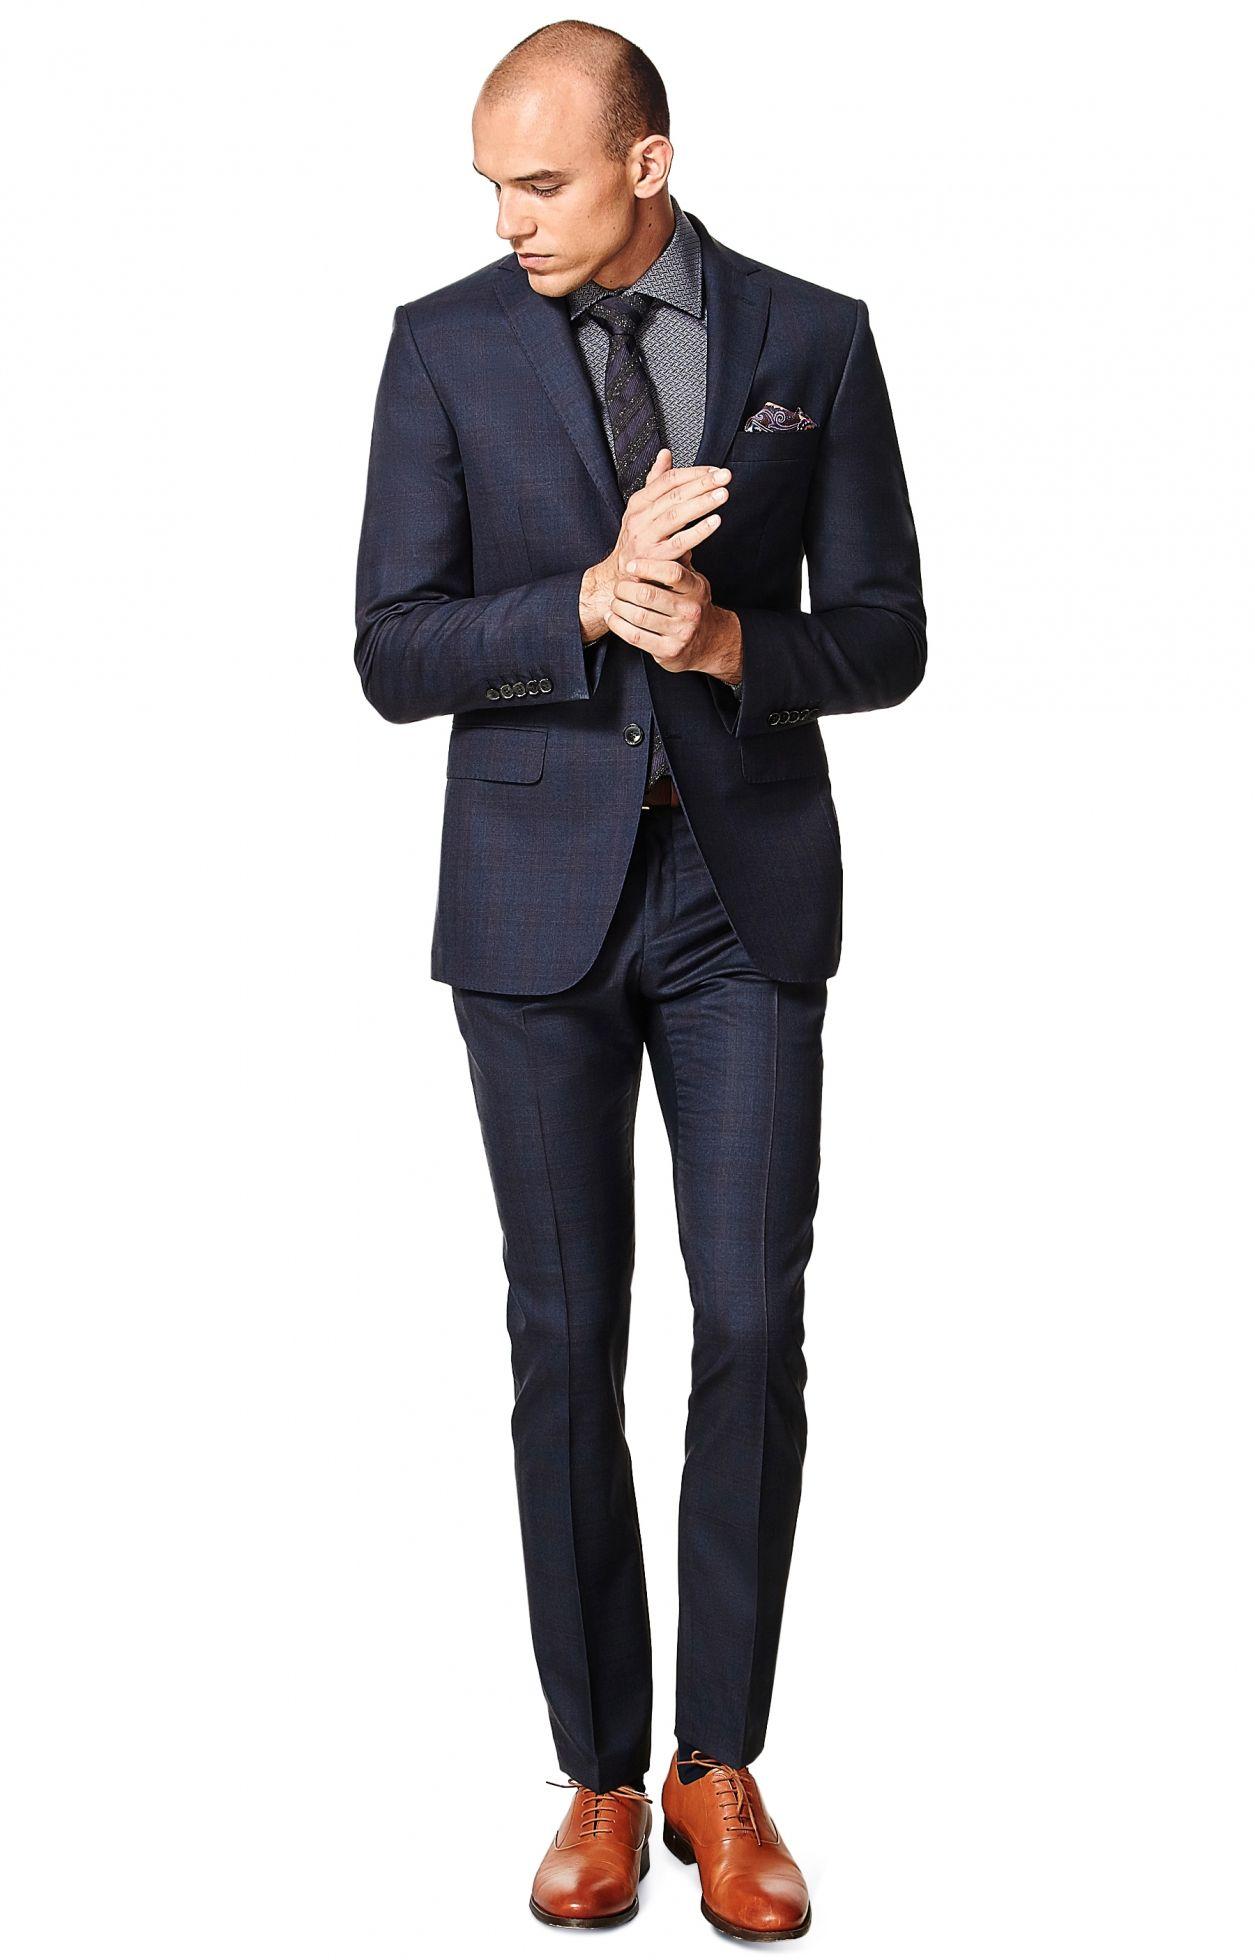 Garnitur Serge Bis 1499 99 Zl 75296 Sklep Vistula Pl Mens Suits Style Pantsuit